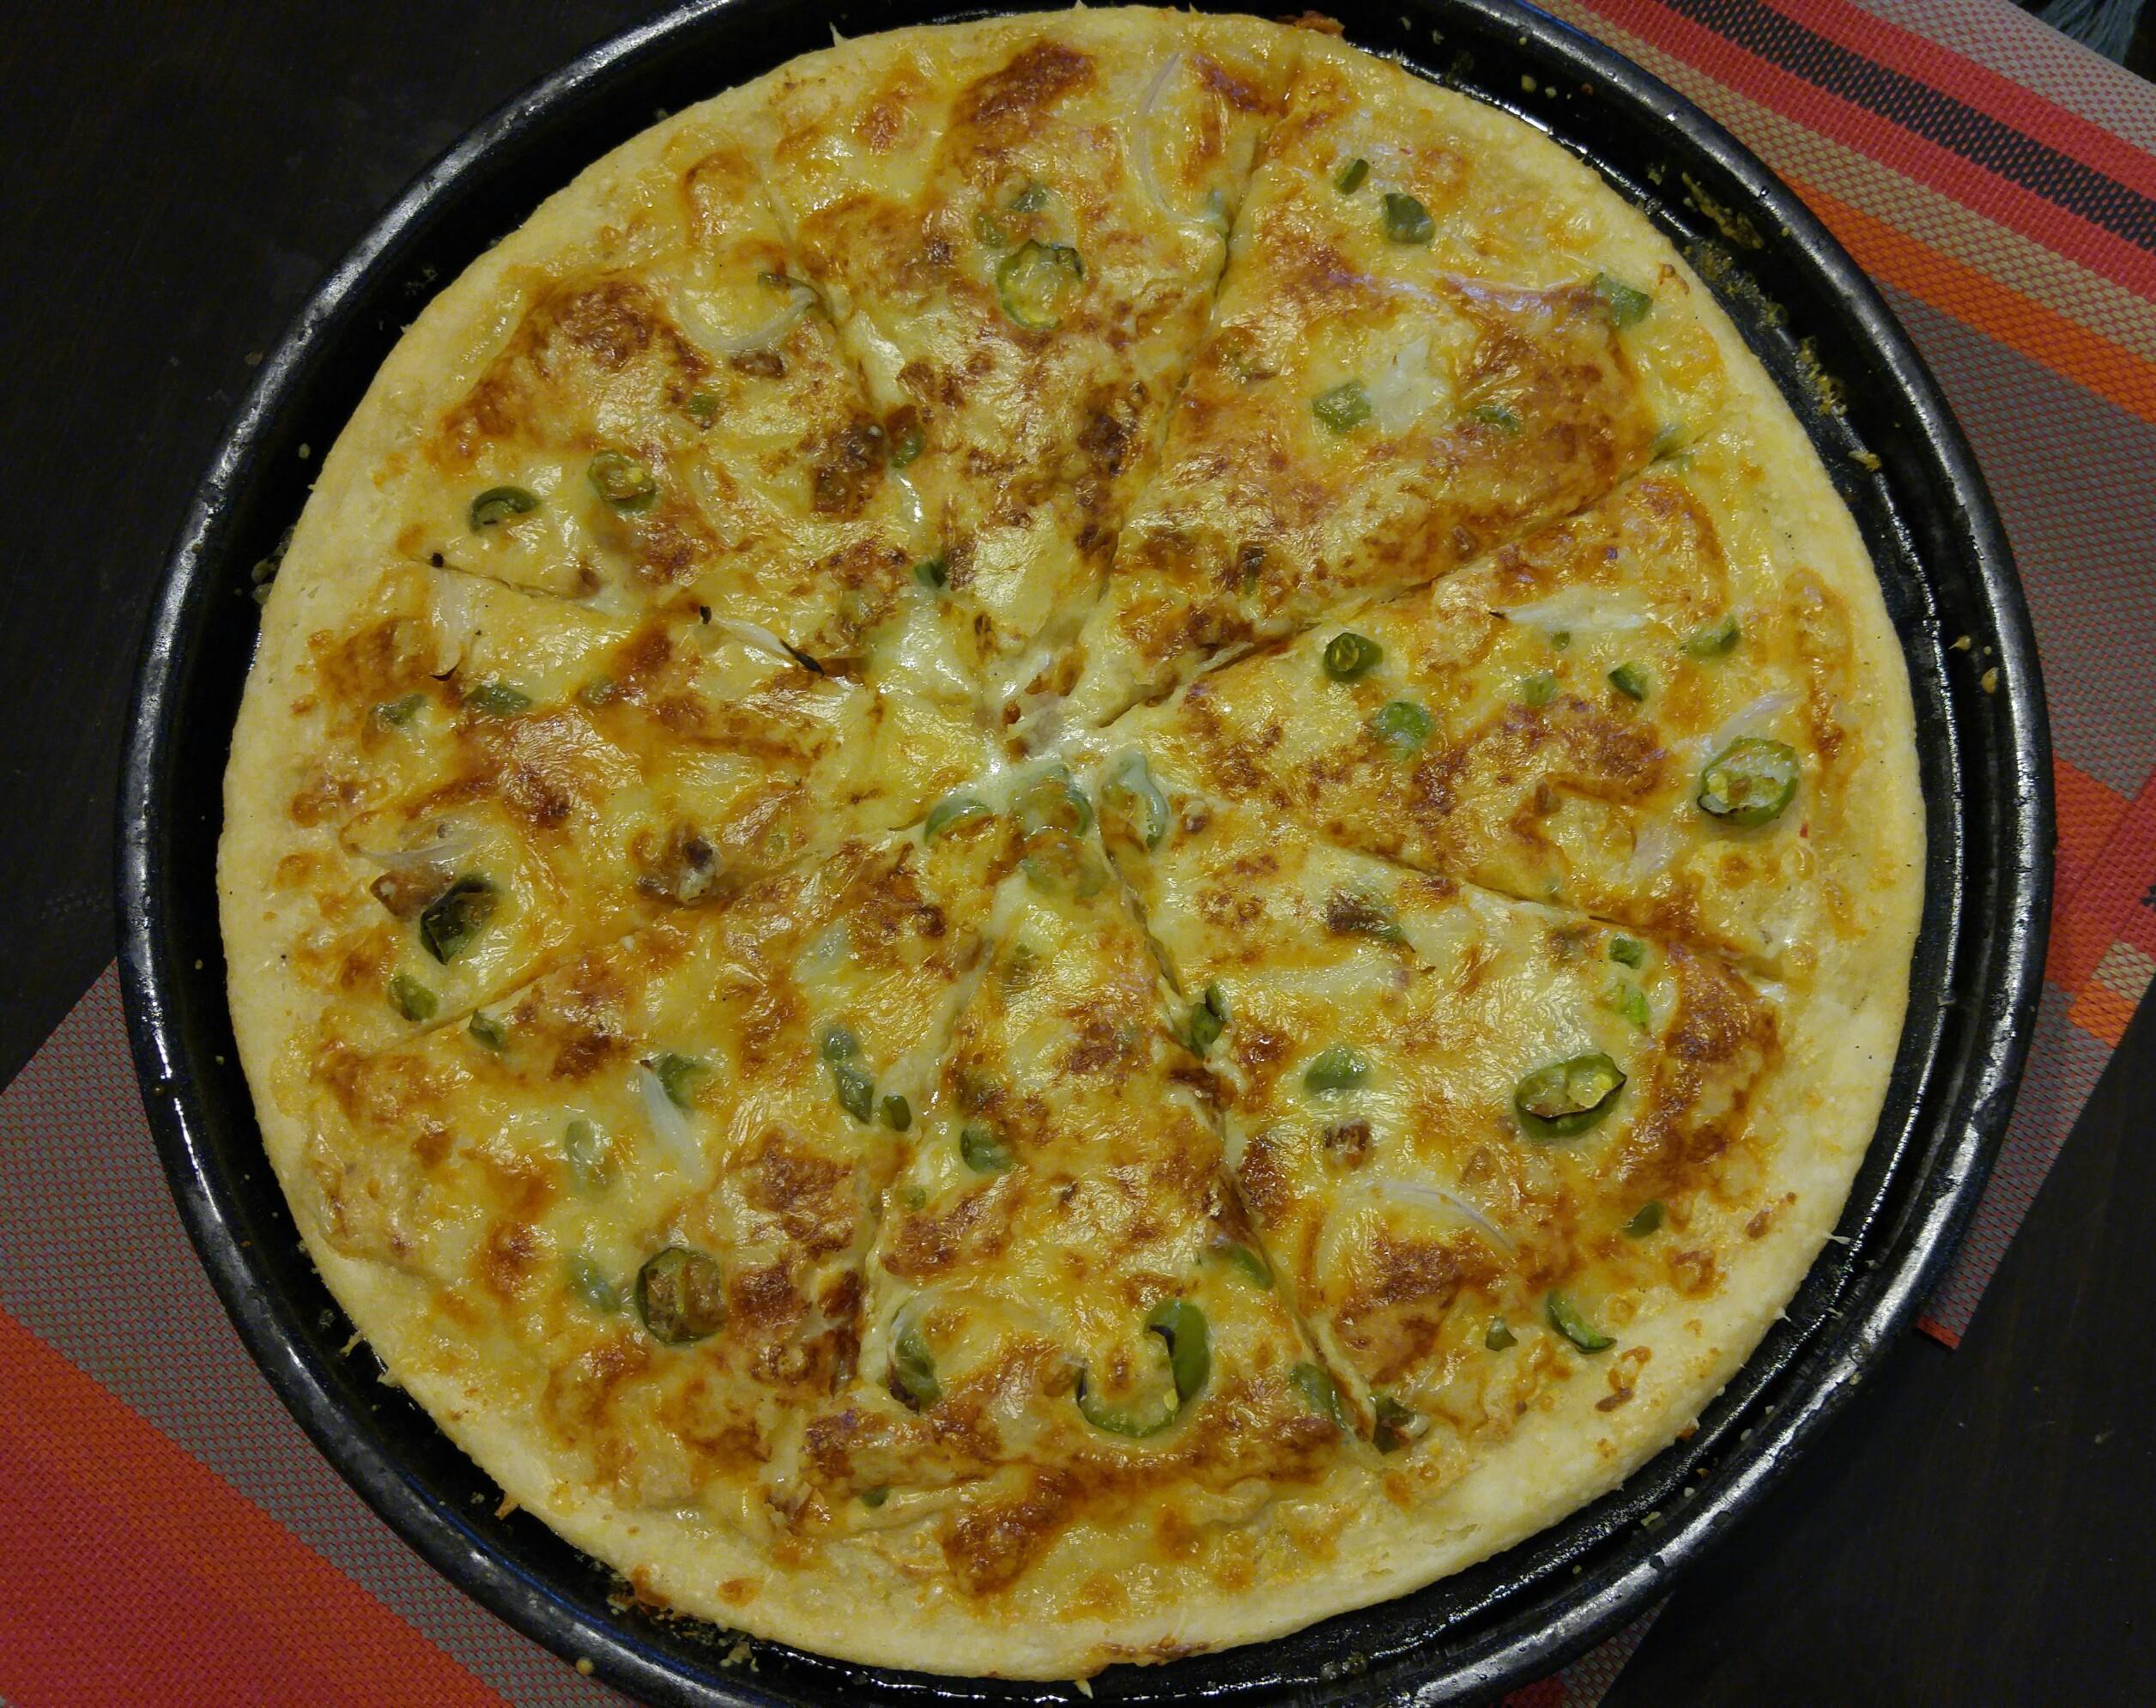 Creamy Garlic Pizza Sauce  Meet my homemade Creamy Garlic Pizza Made from creamy